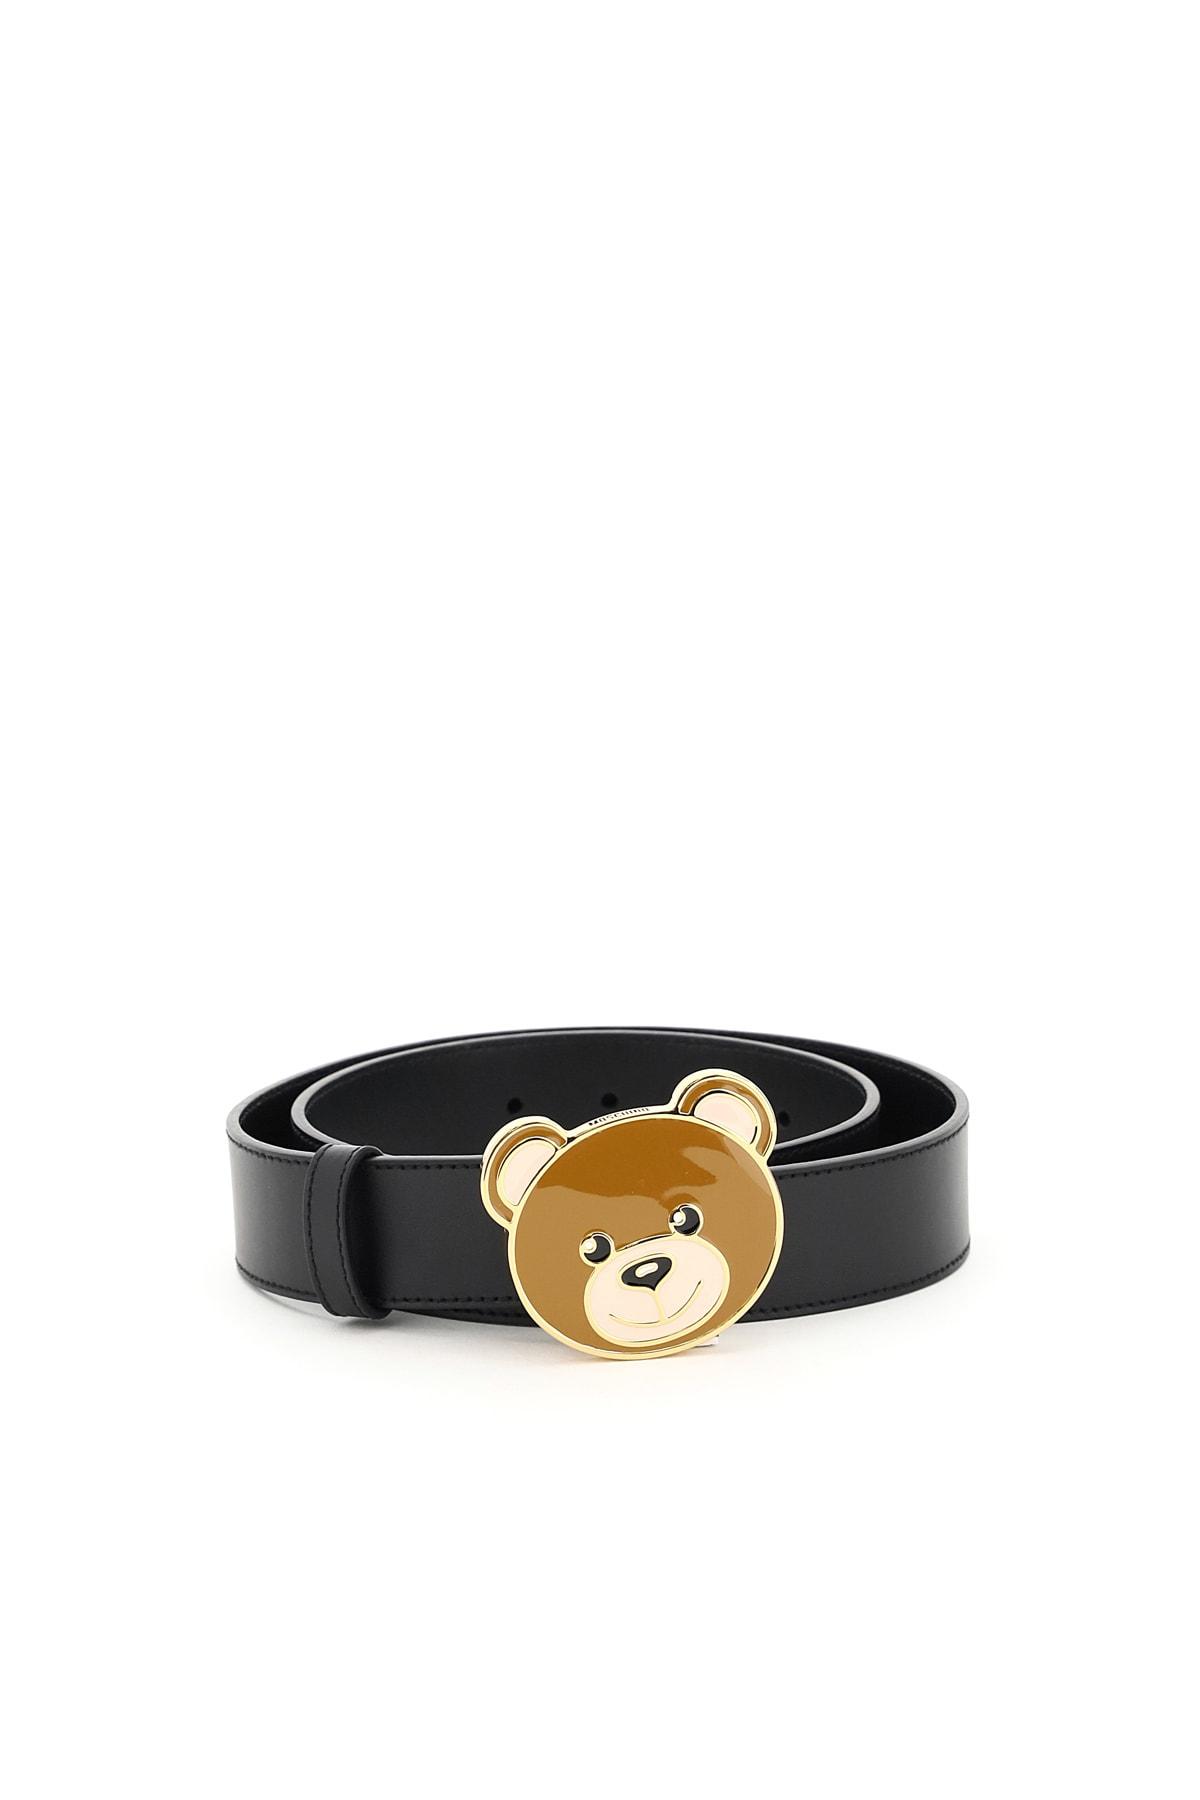 Moschino TEDDY BEAR BUCKLE BELT